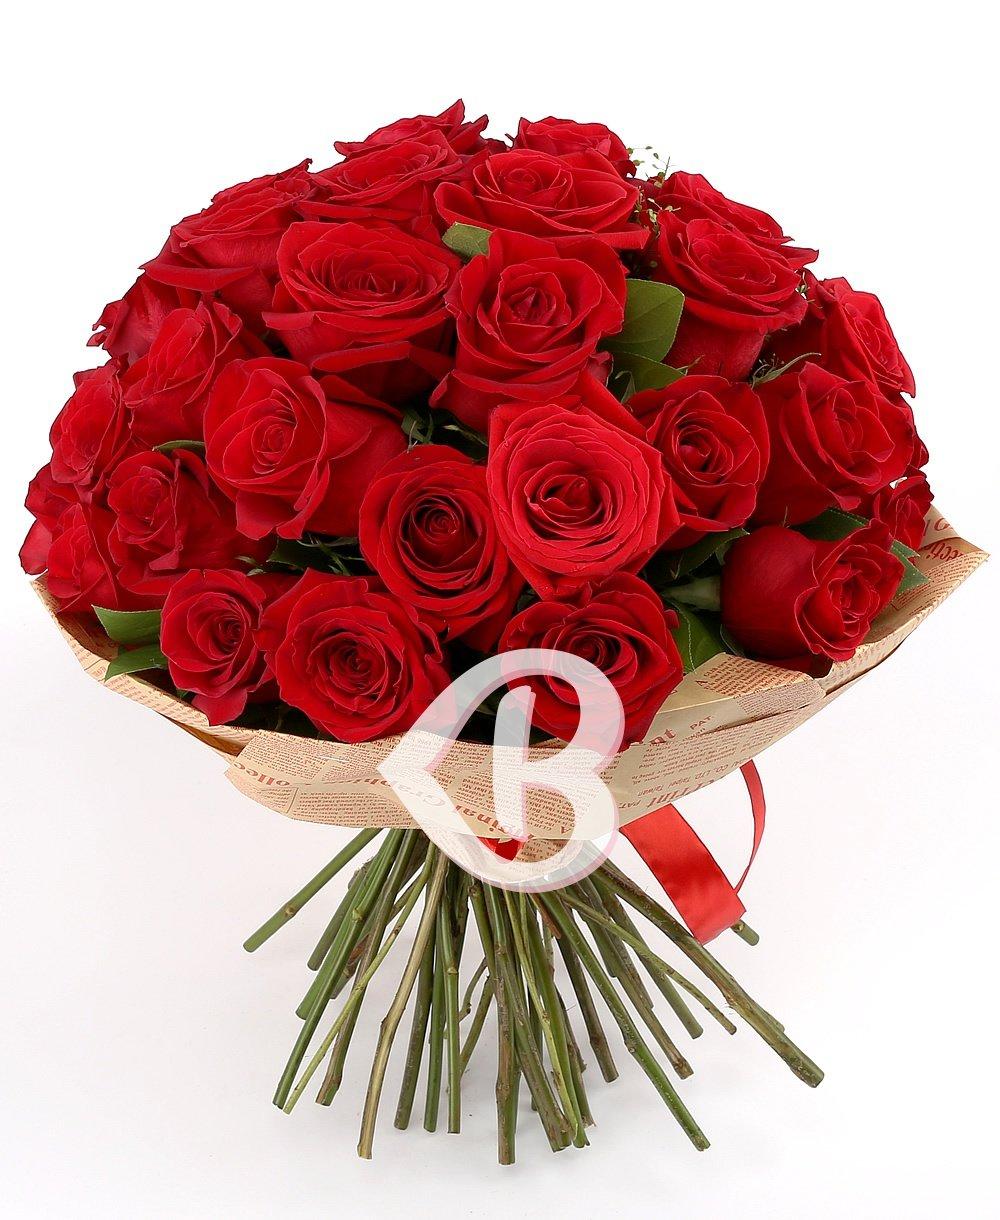 Imaginea produsului 35 Trandafiri roșii